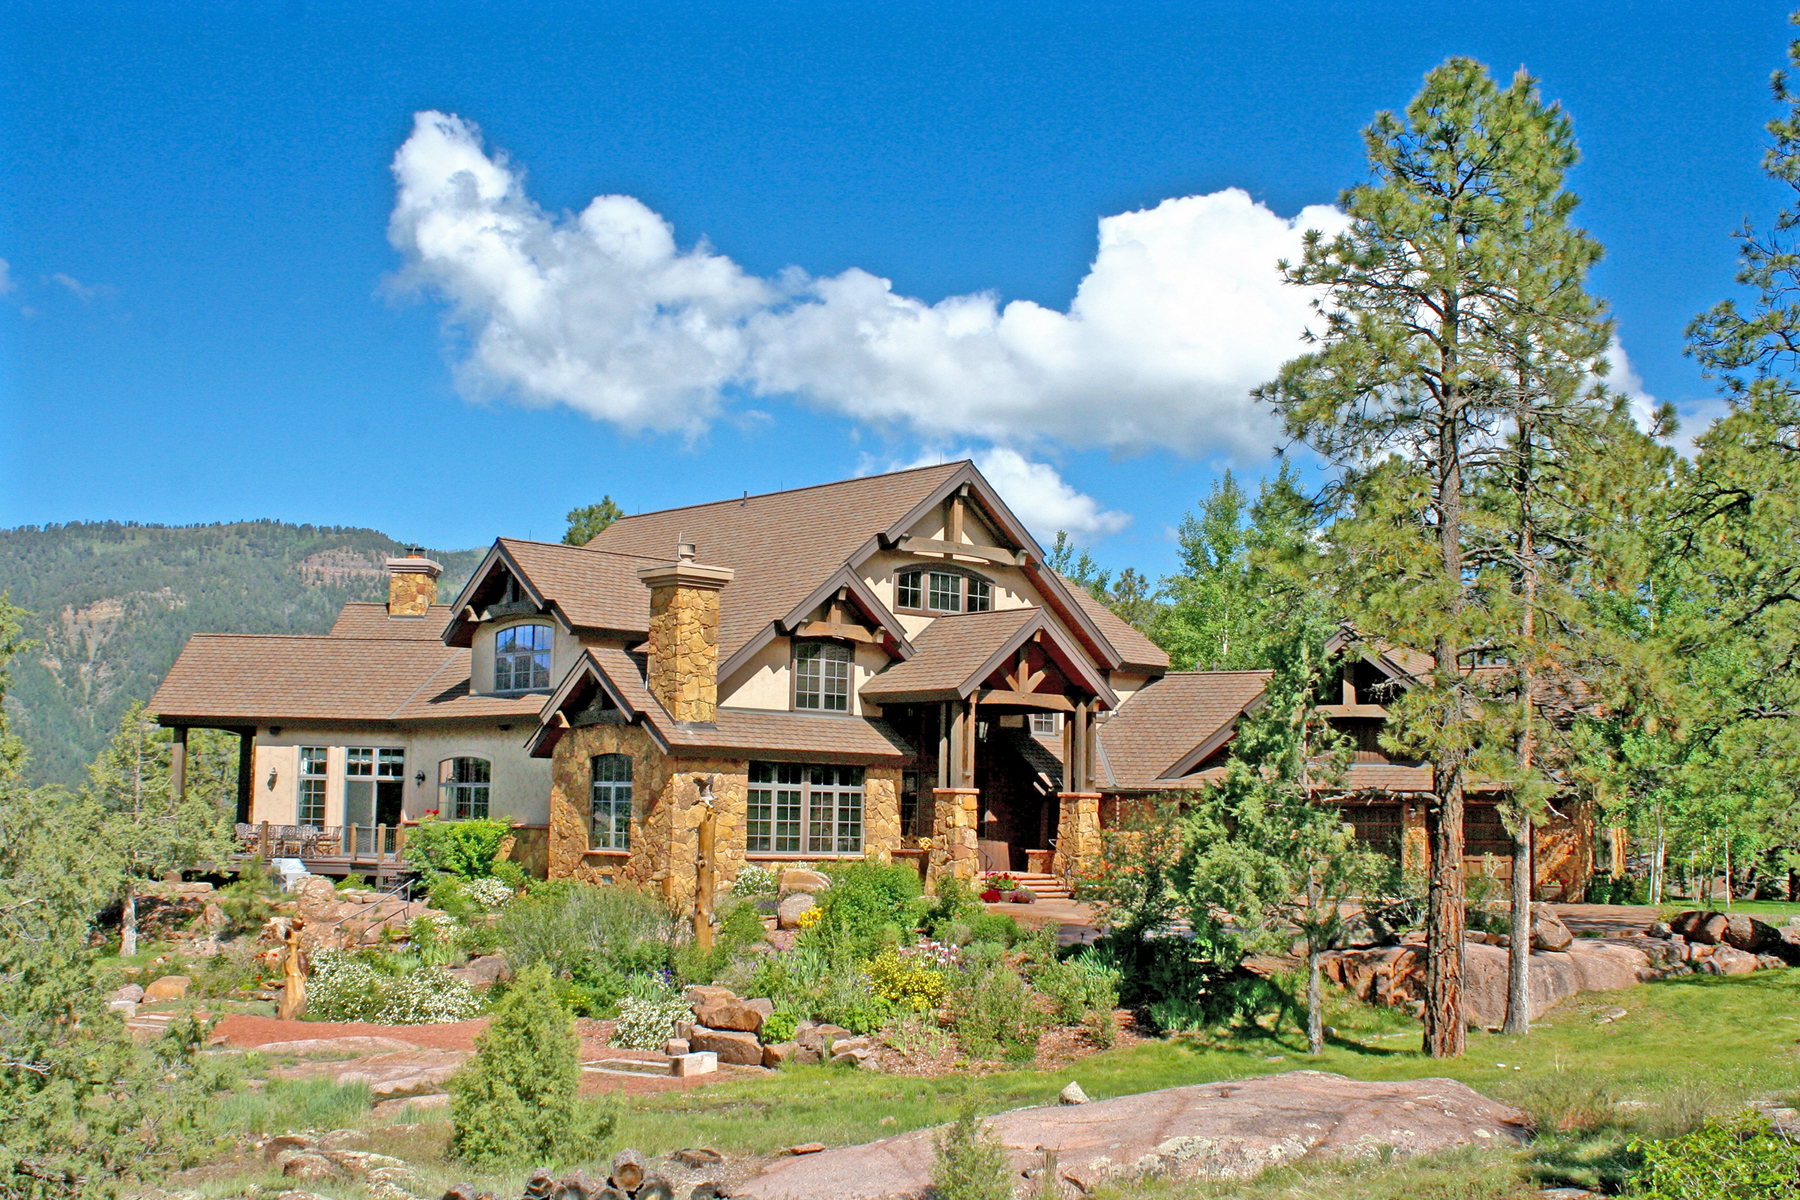 Property For Sale at Granite Fall Lodge